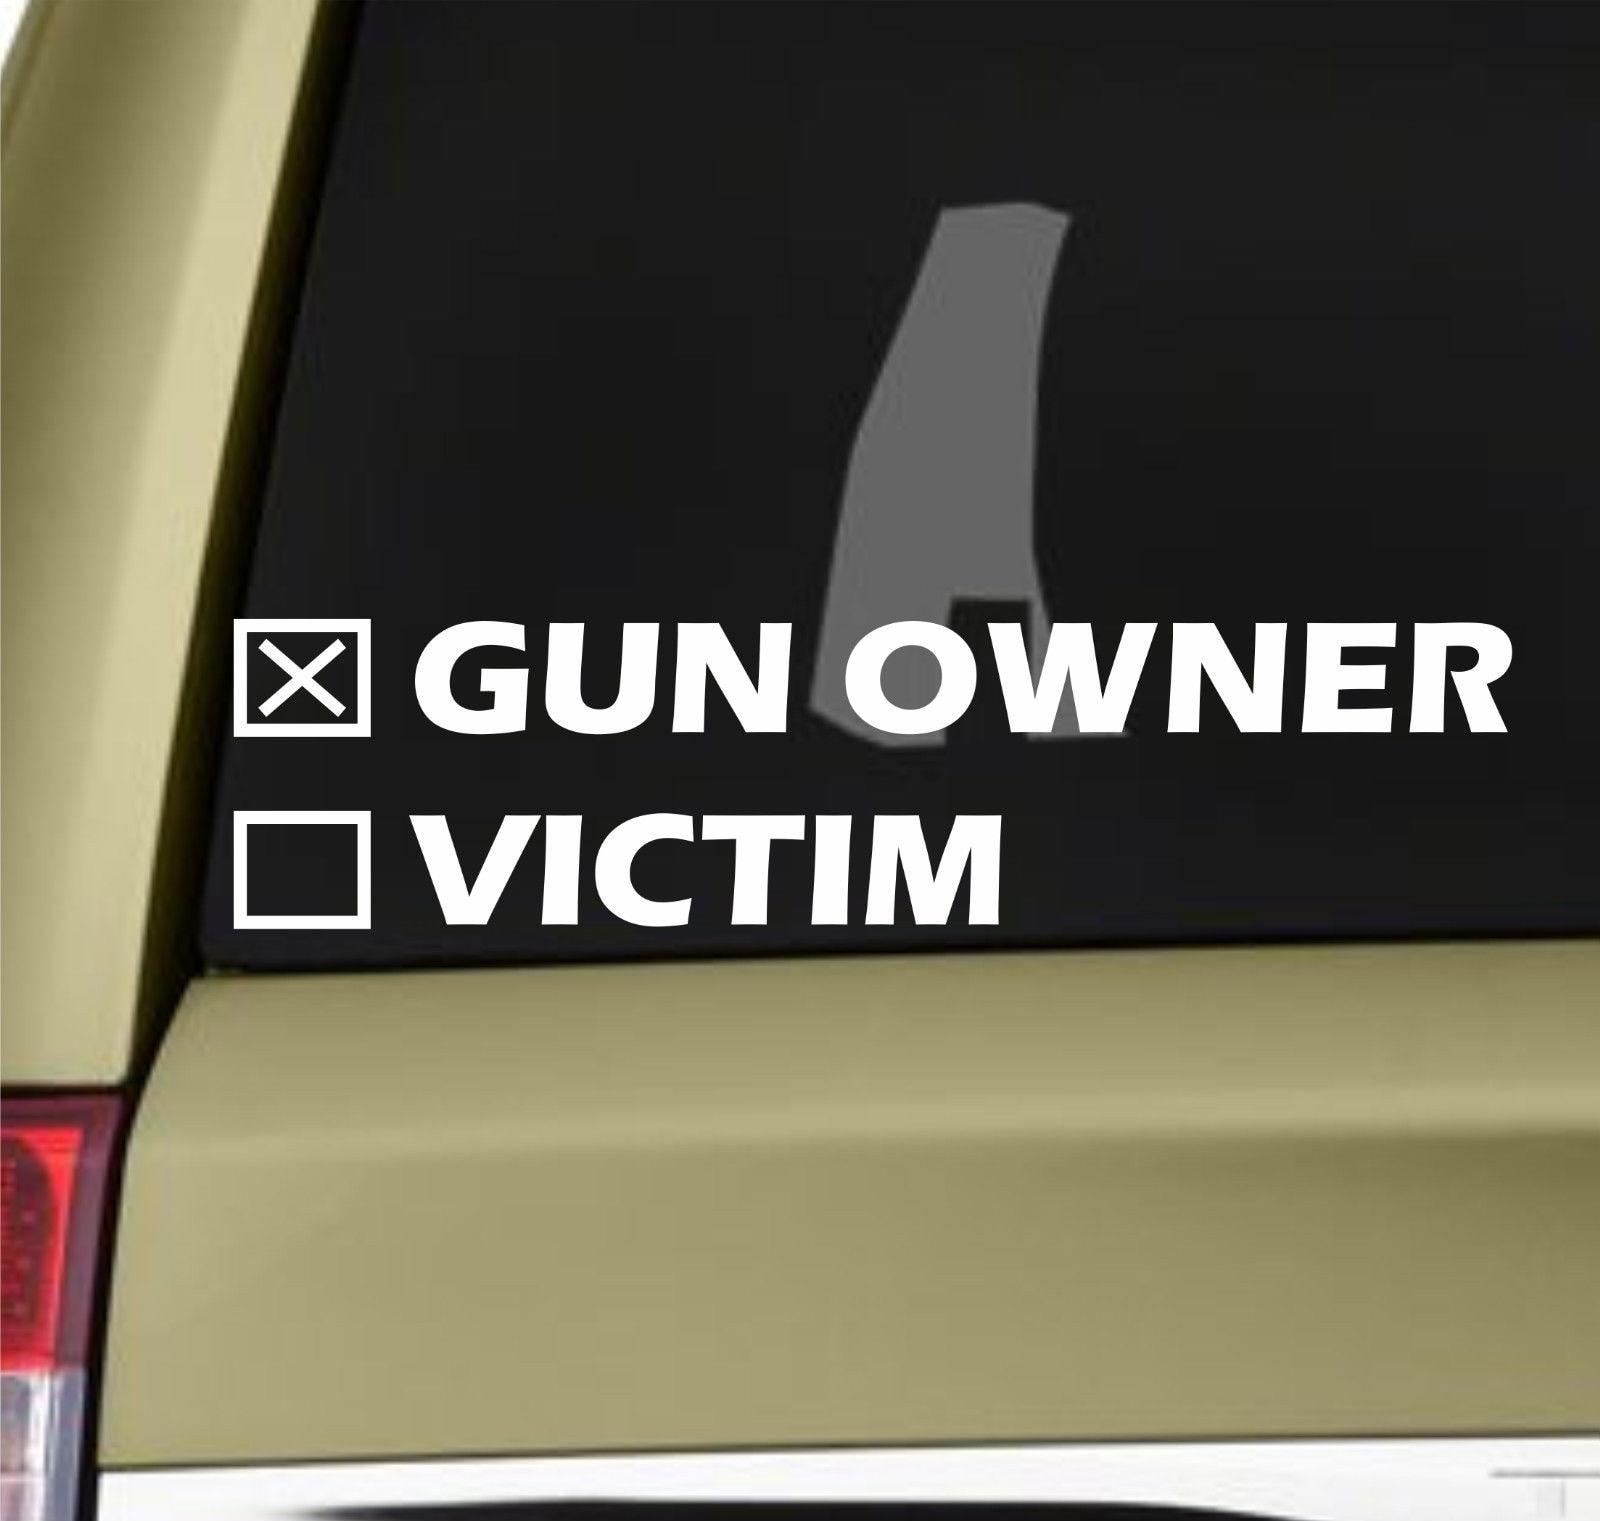 Arma proprietário ou vítima adesivos vinil decalque pro nra pistola bala rifle m16 20x5cm